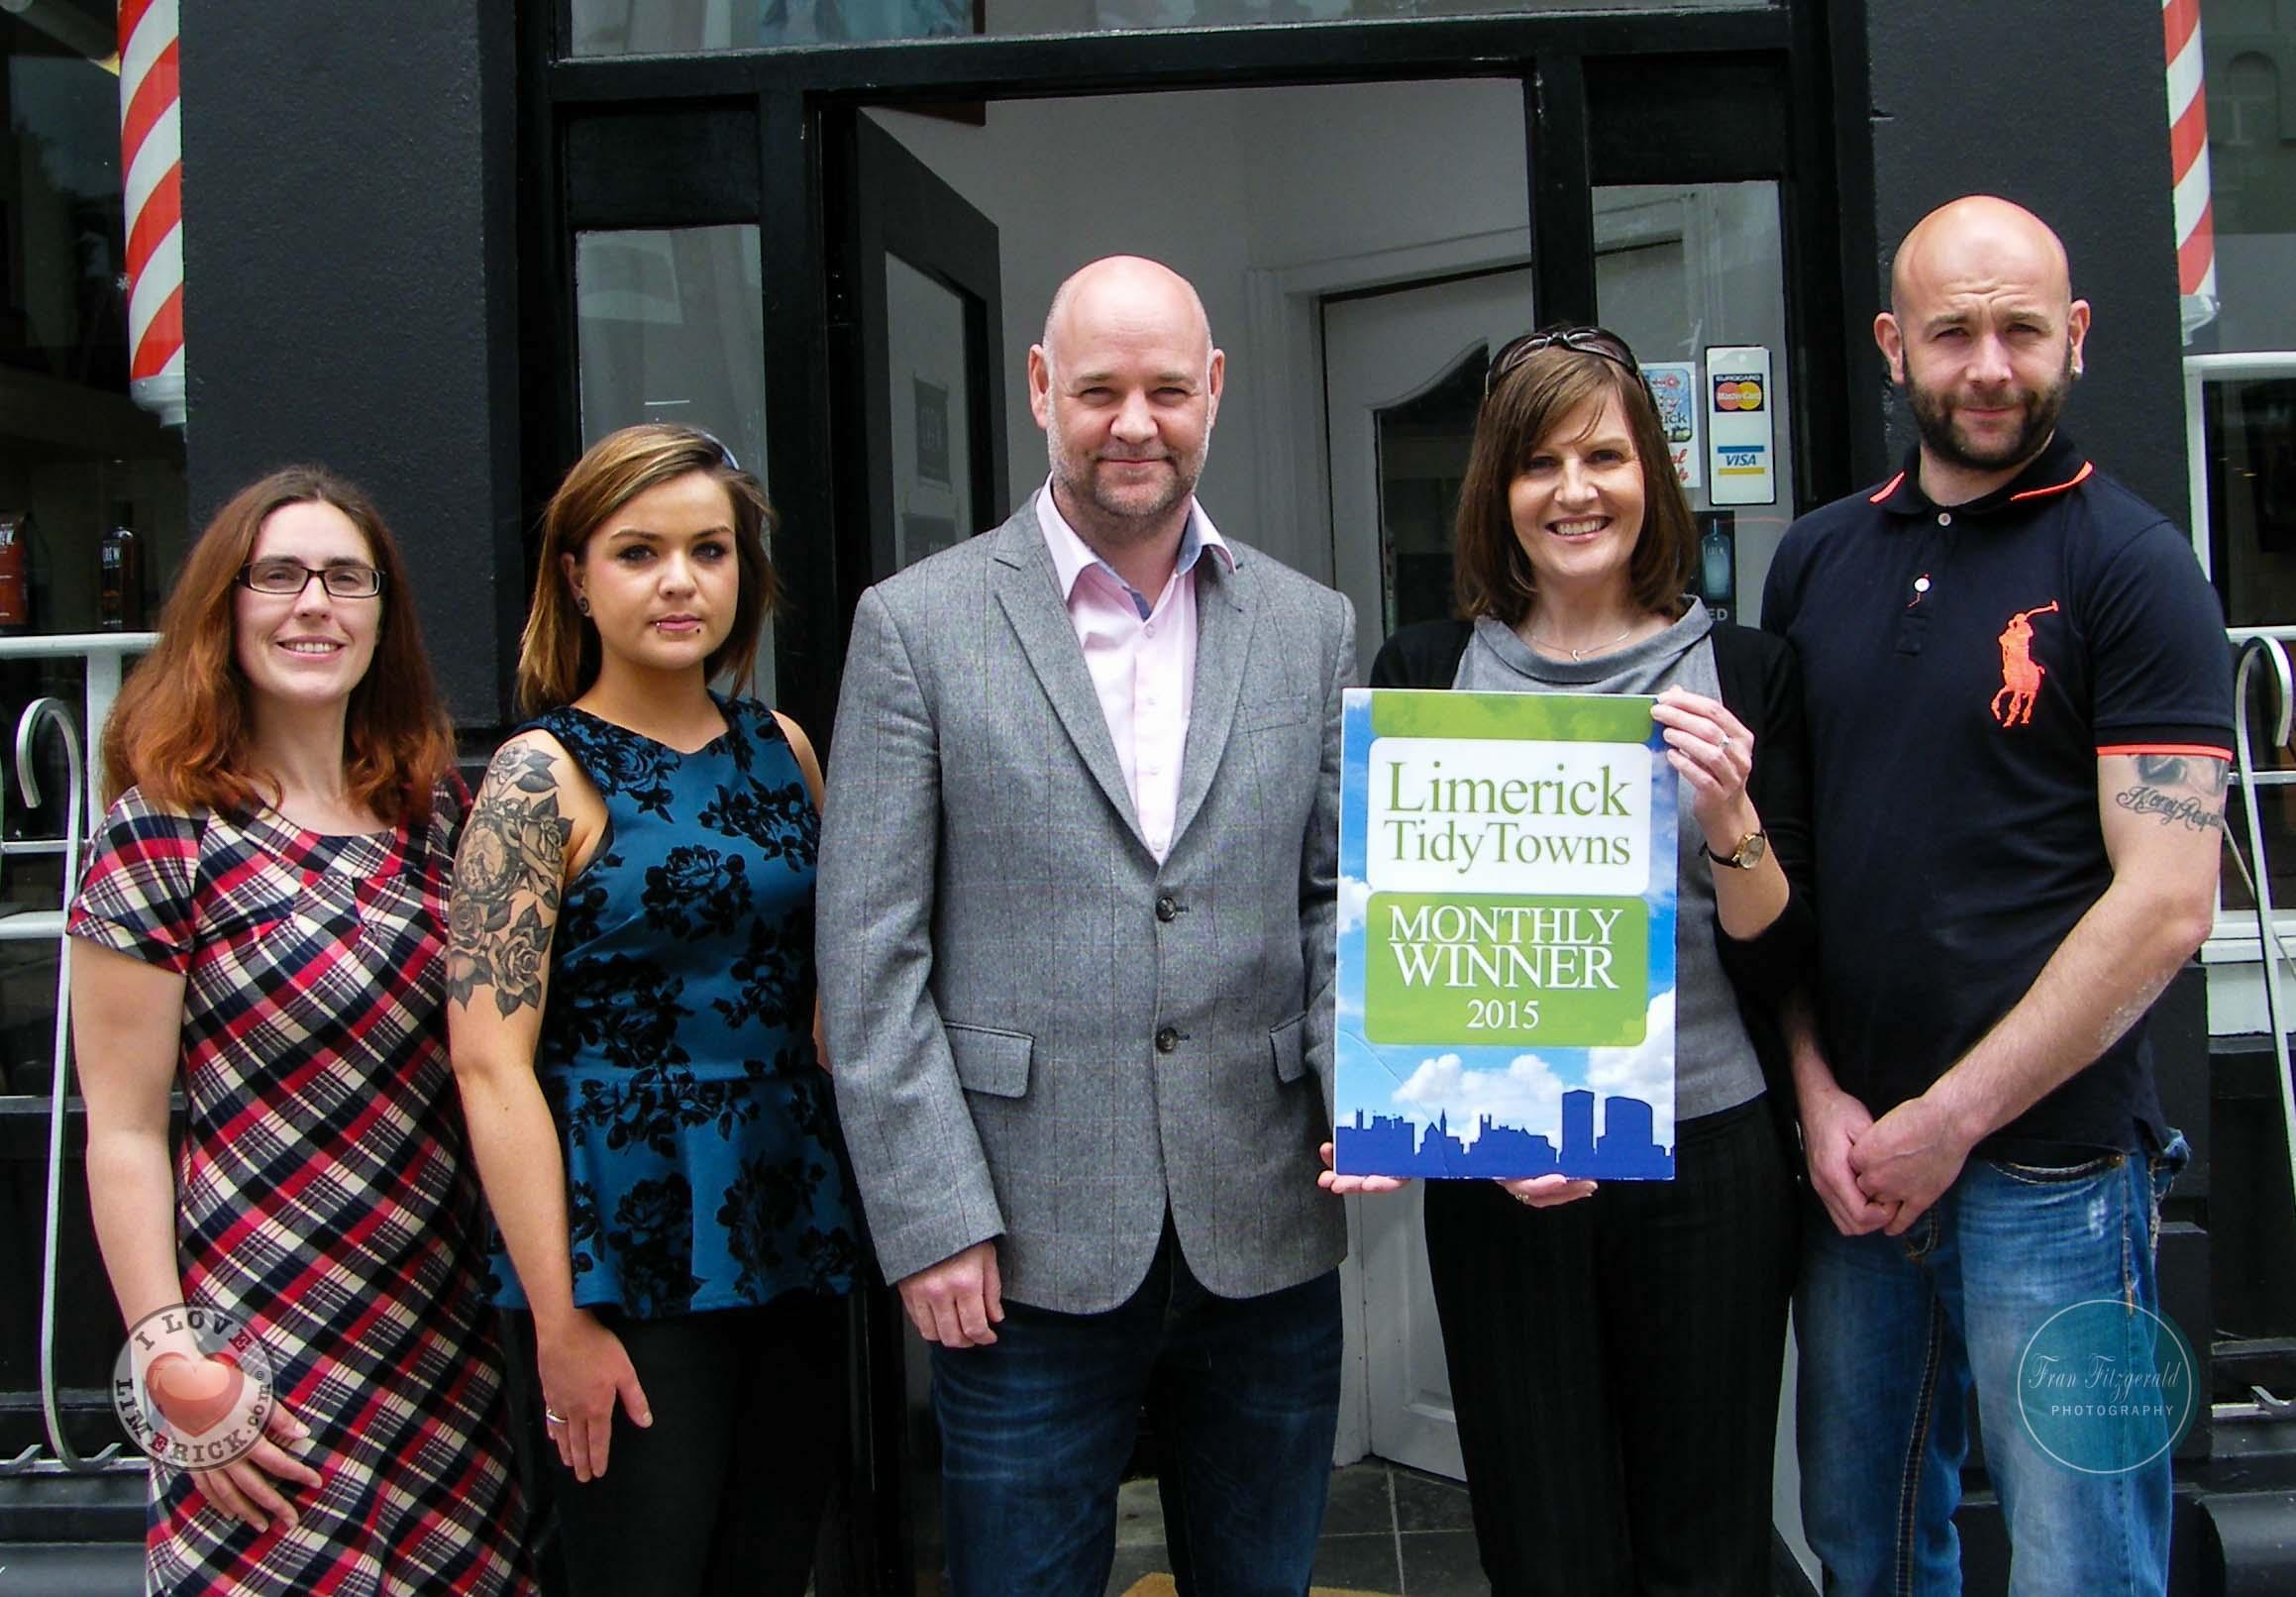 Limerick Tidy Towns awards Figaro Barber Shop as winner for June 2015